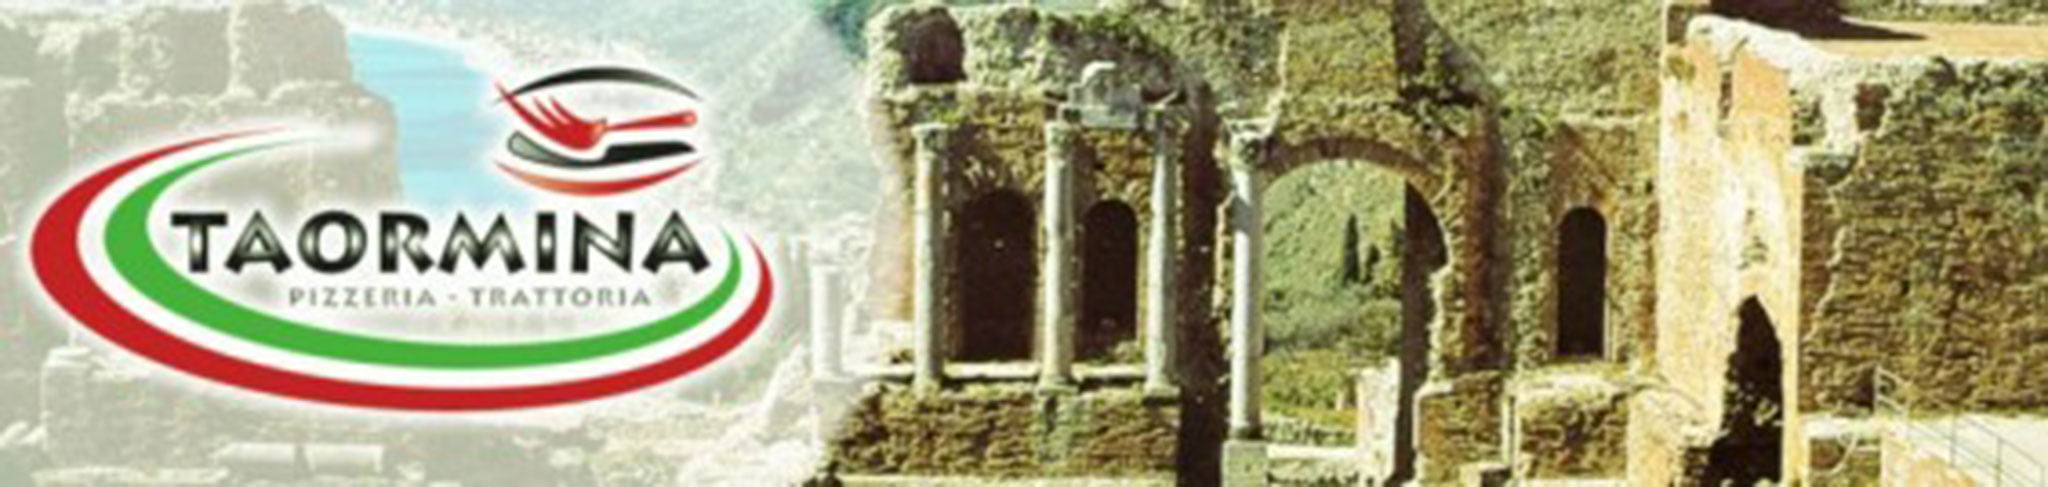 Logotipo Taormina